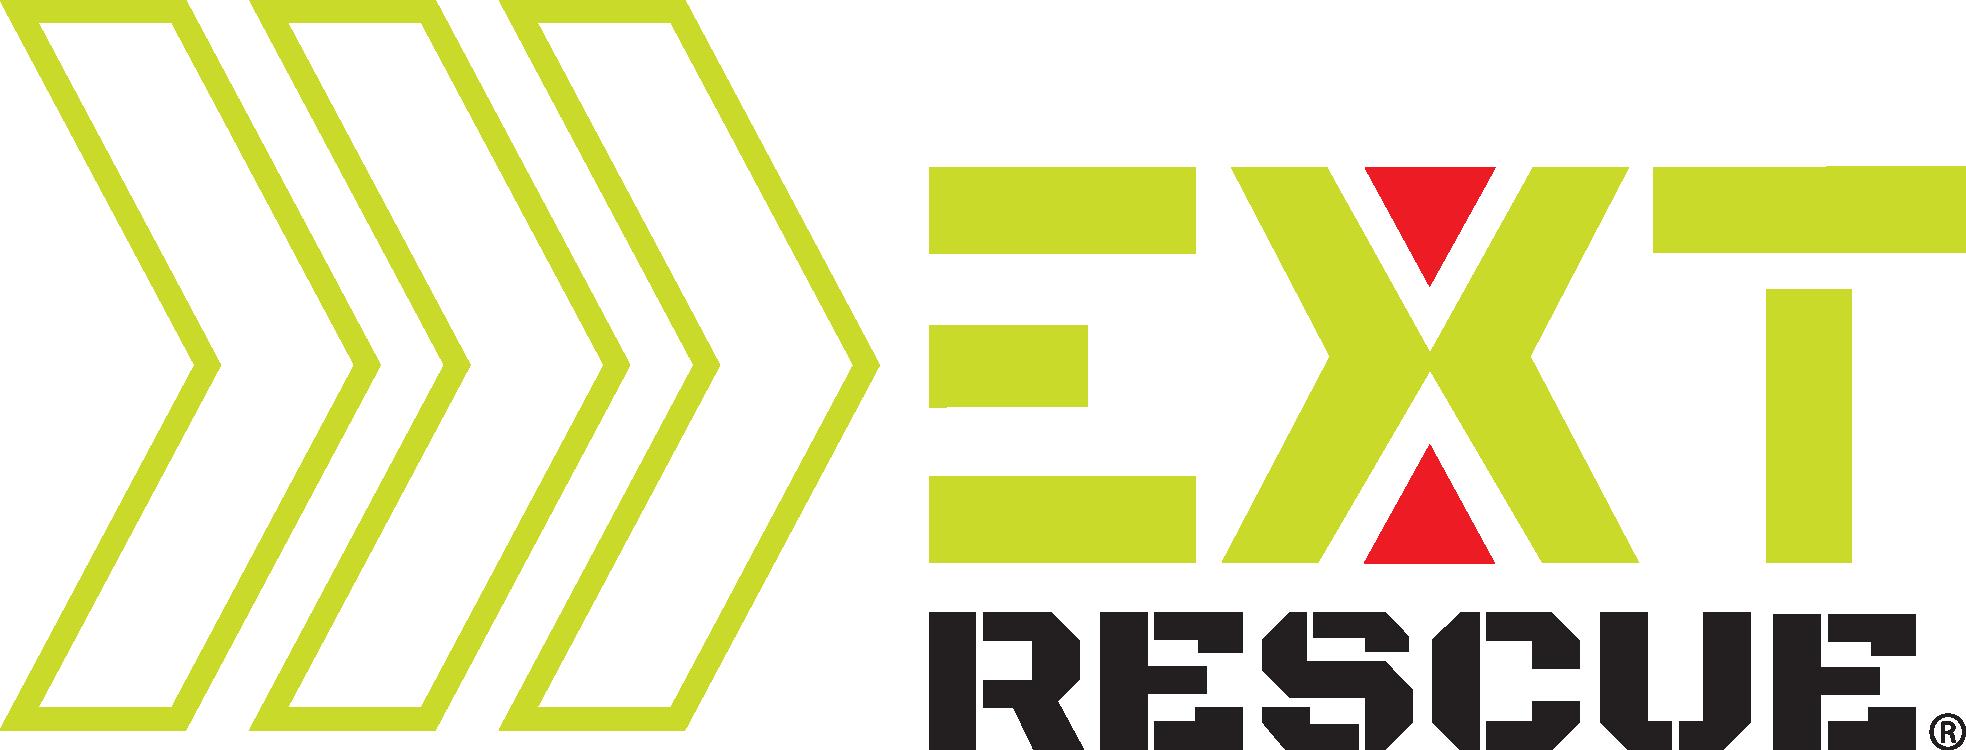 EXT Rescue®